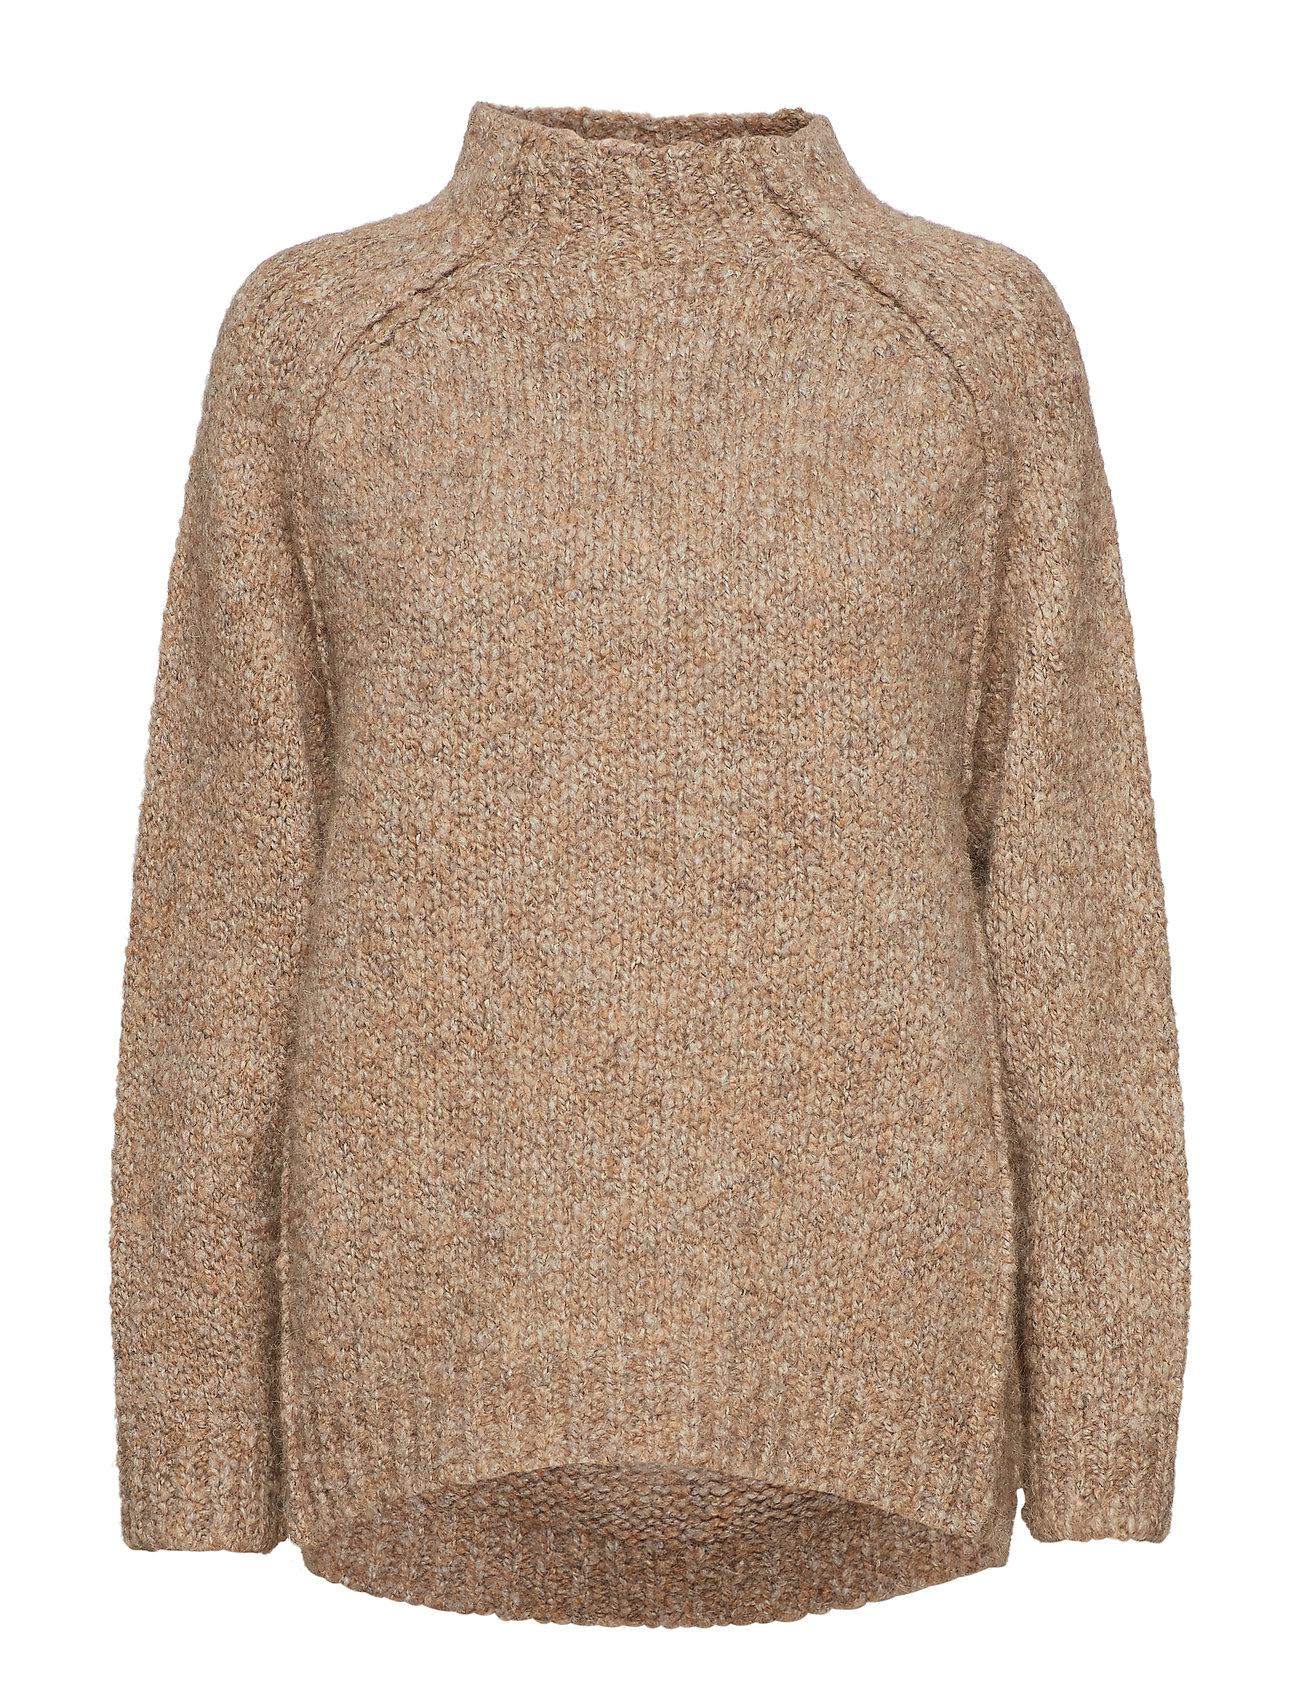 Rabens Saloner Fluffy knit open back sweater Ögrönlar